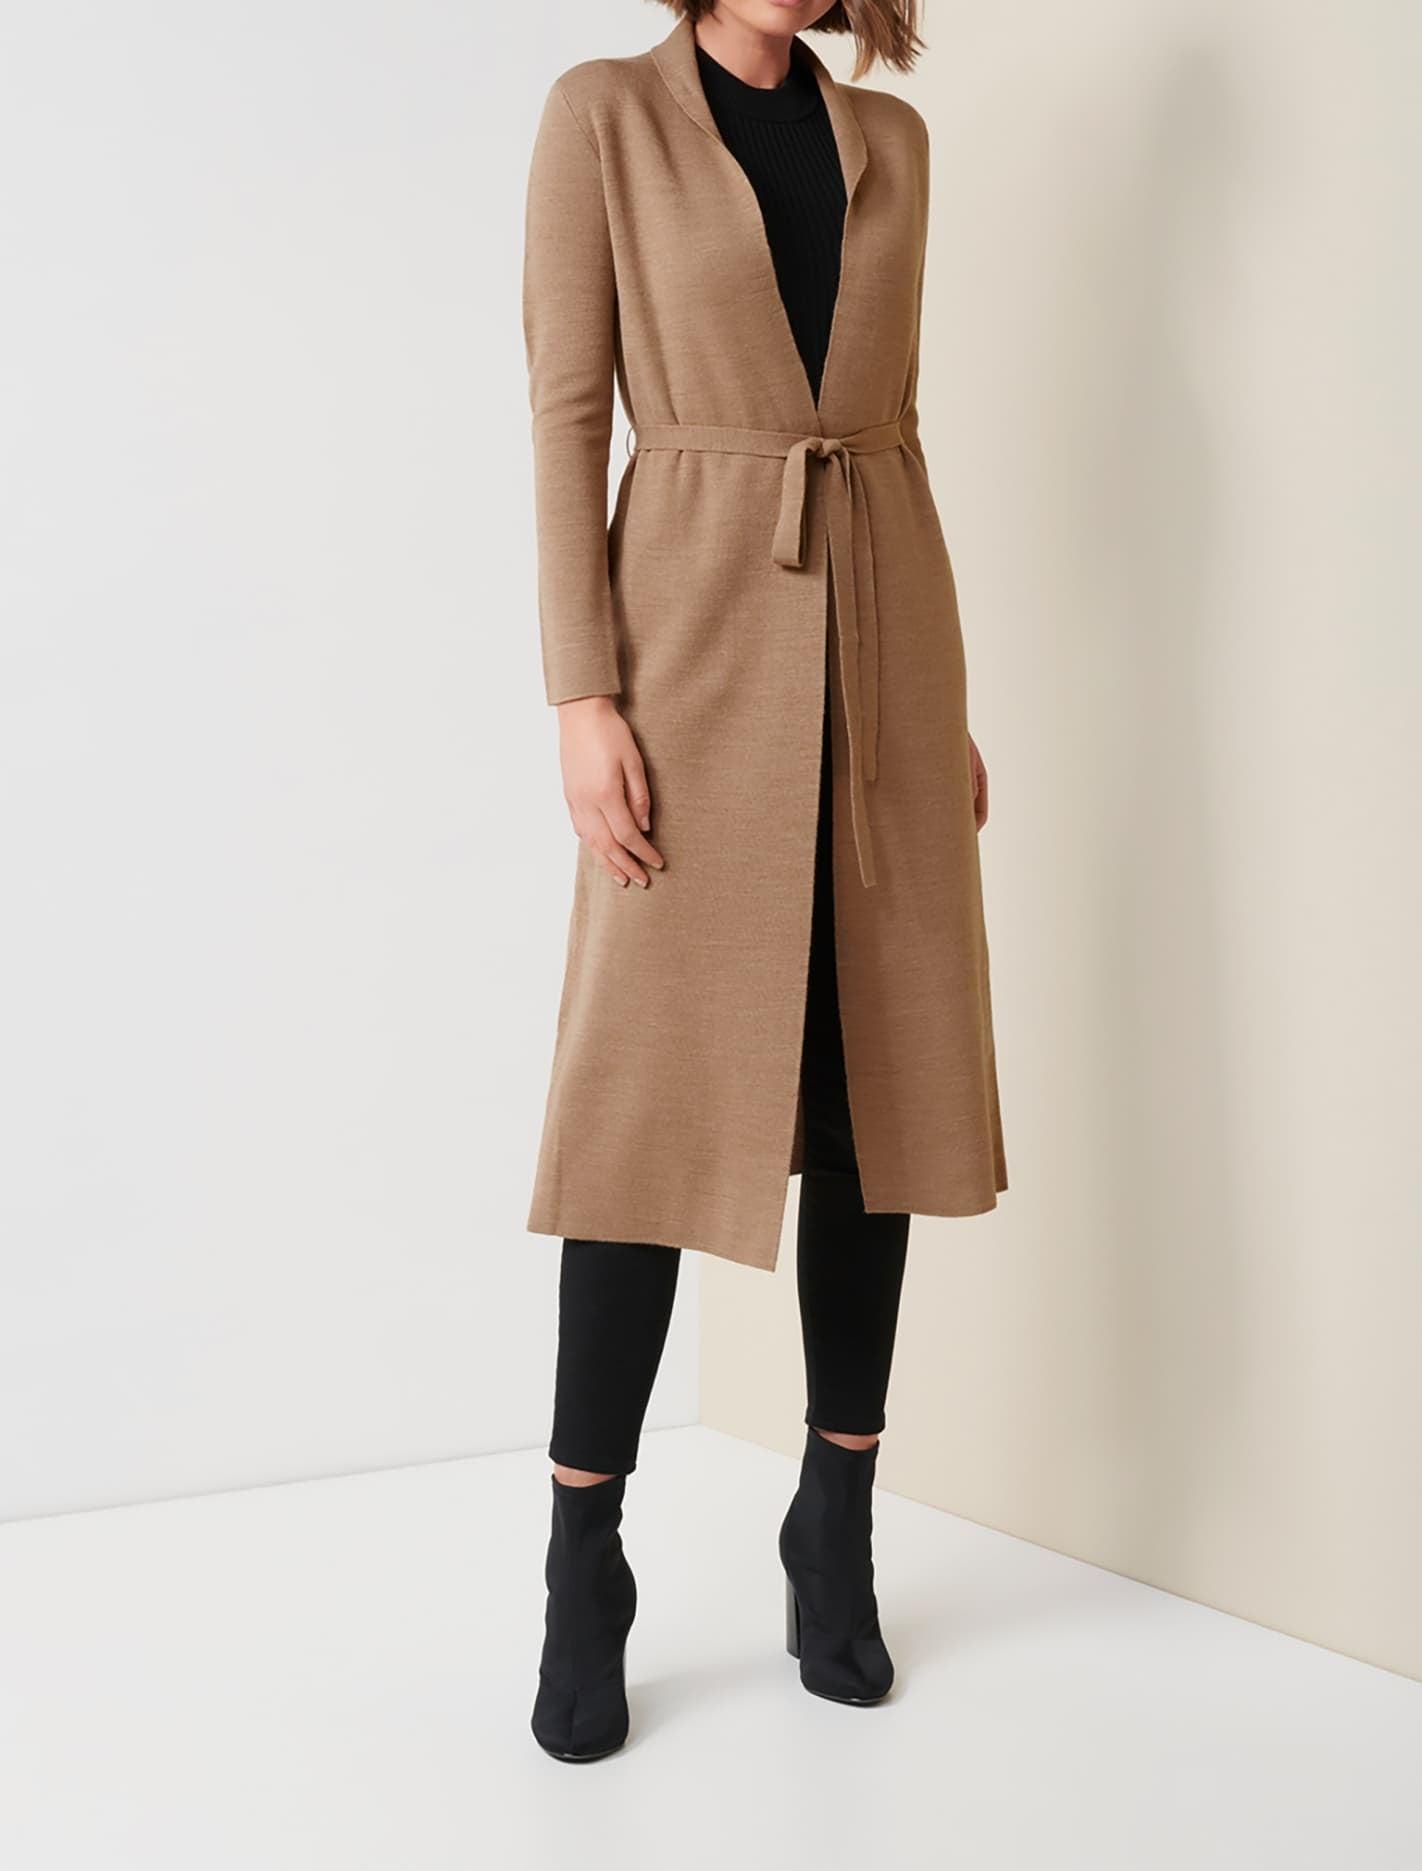 Ever New Mia Wool Blend Longline Knit Cardigan - Camel